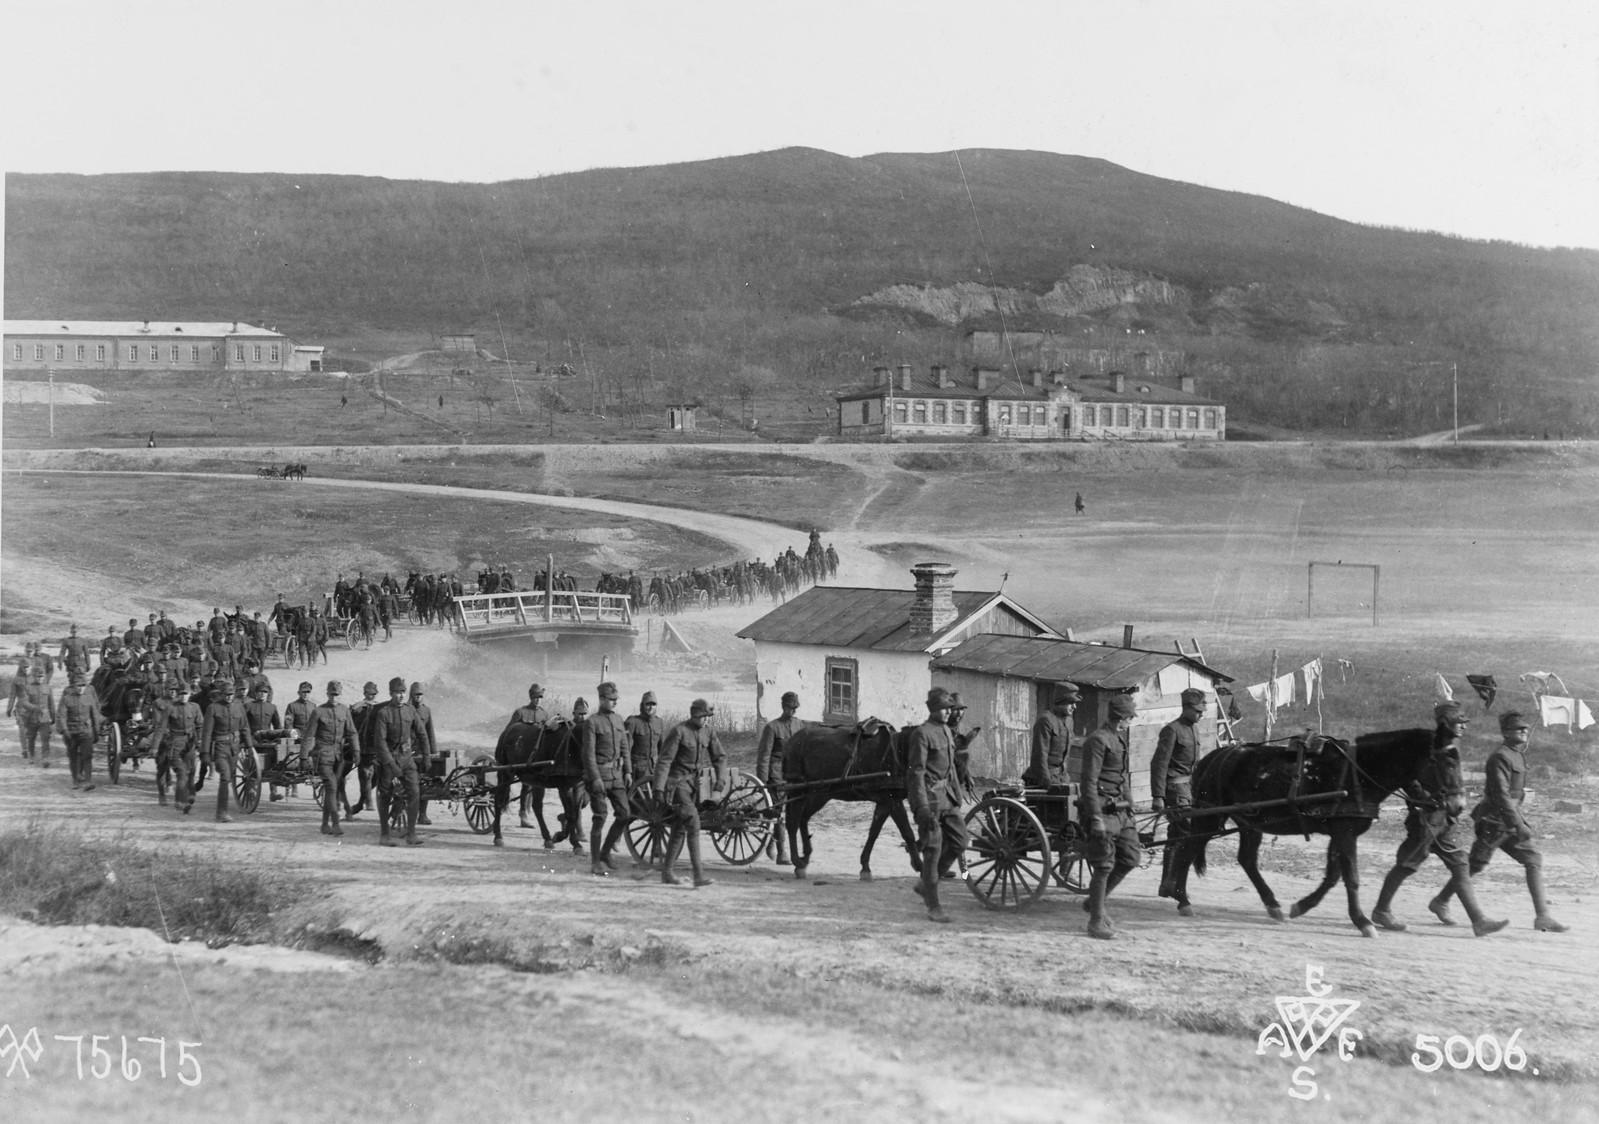 1918. Пулеметная рота 31-го пехотного полка США на марше 9 ноября